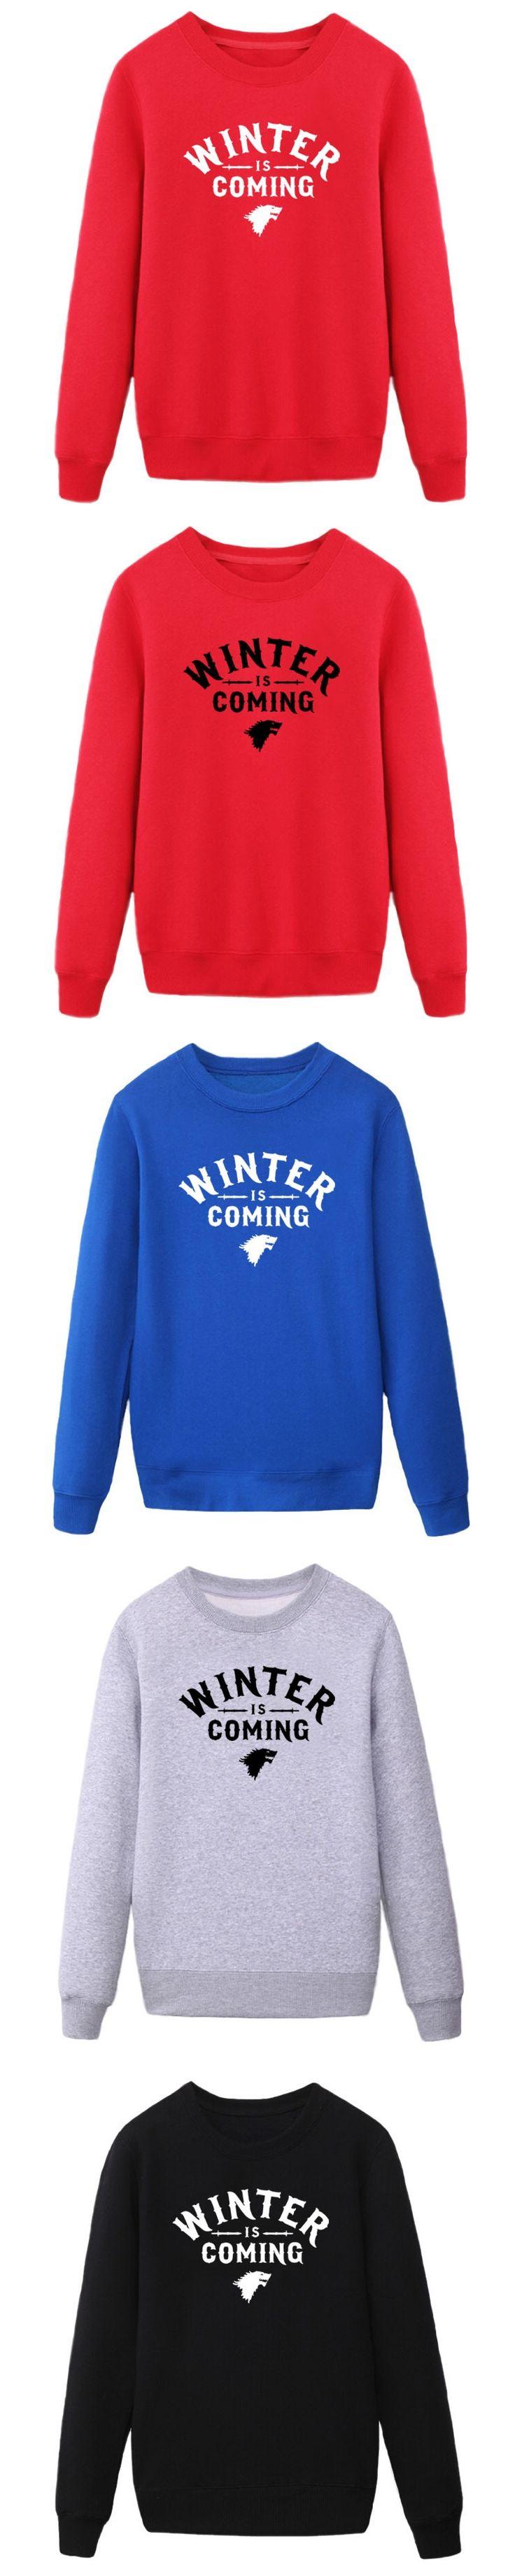 Free Shipping Hip Hop Game of Thrones Winter Is Coming Casual Men Printed Mens sweatshirt hoodies Wholesale Man Clothing